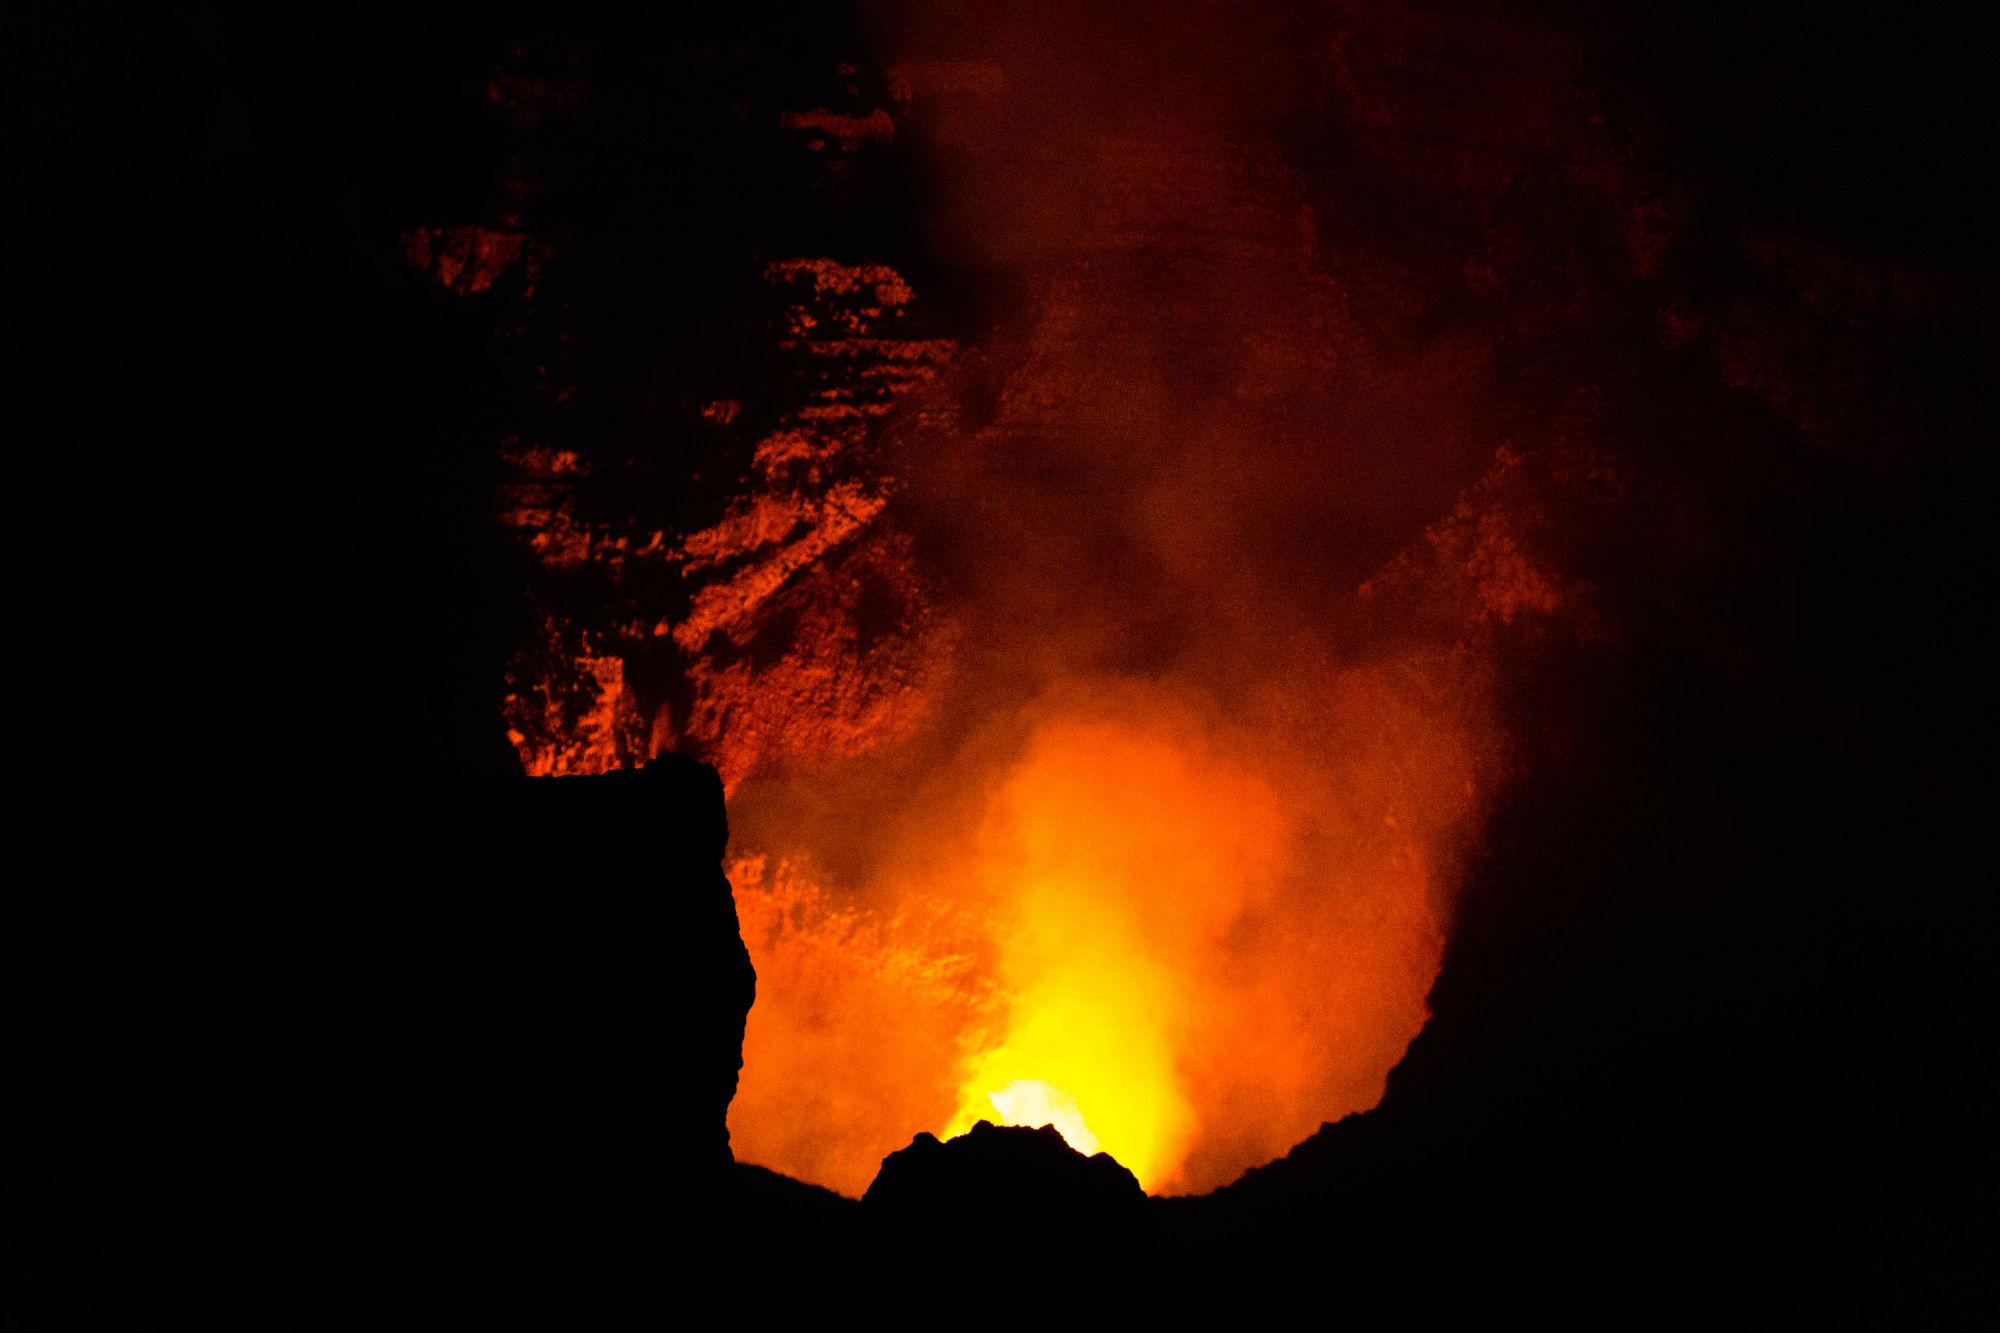 The Red Hot Inside of Masaya